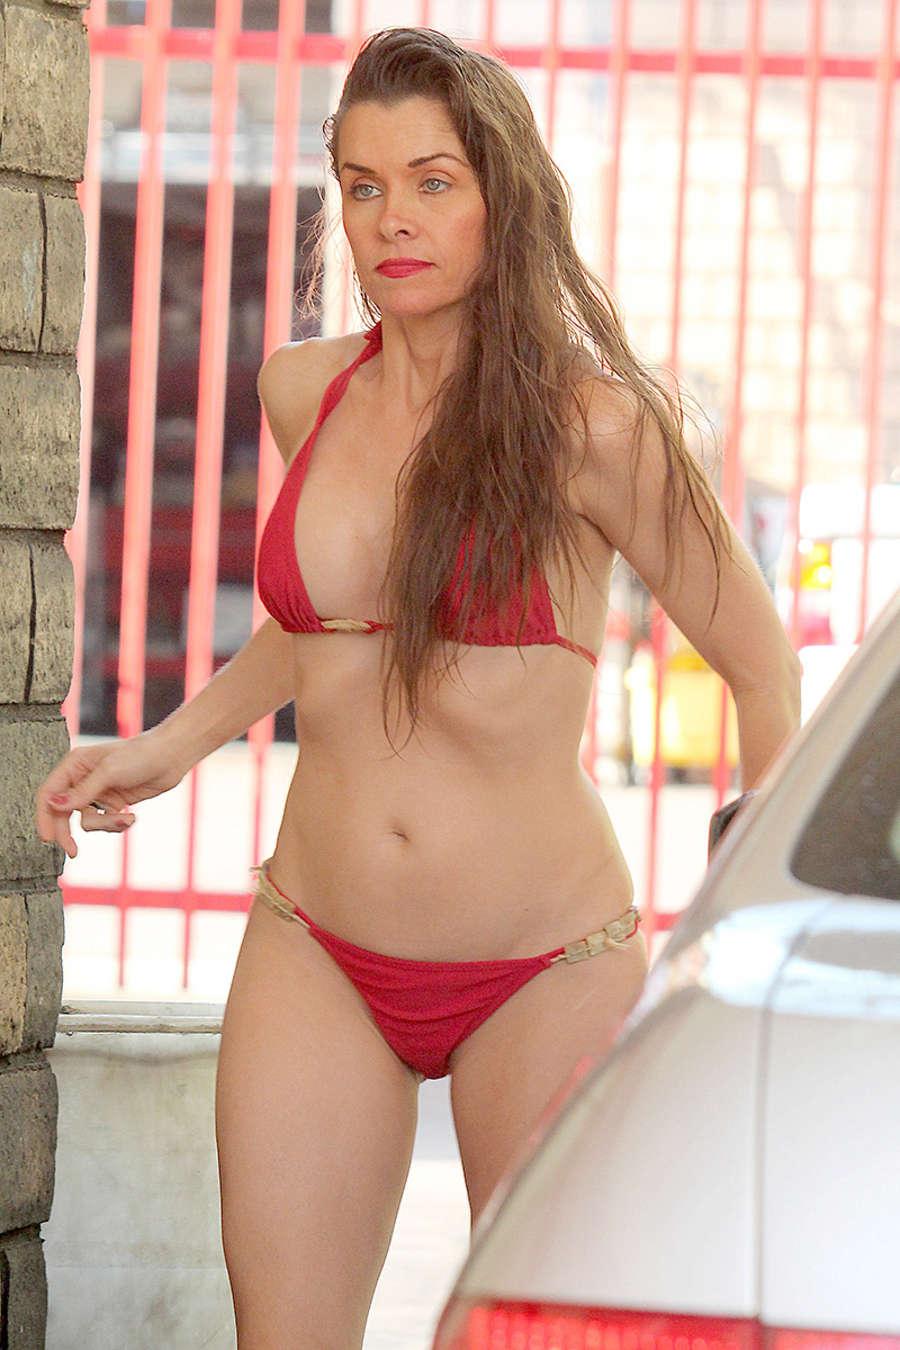 Redhead woman posing naked